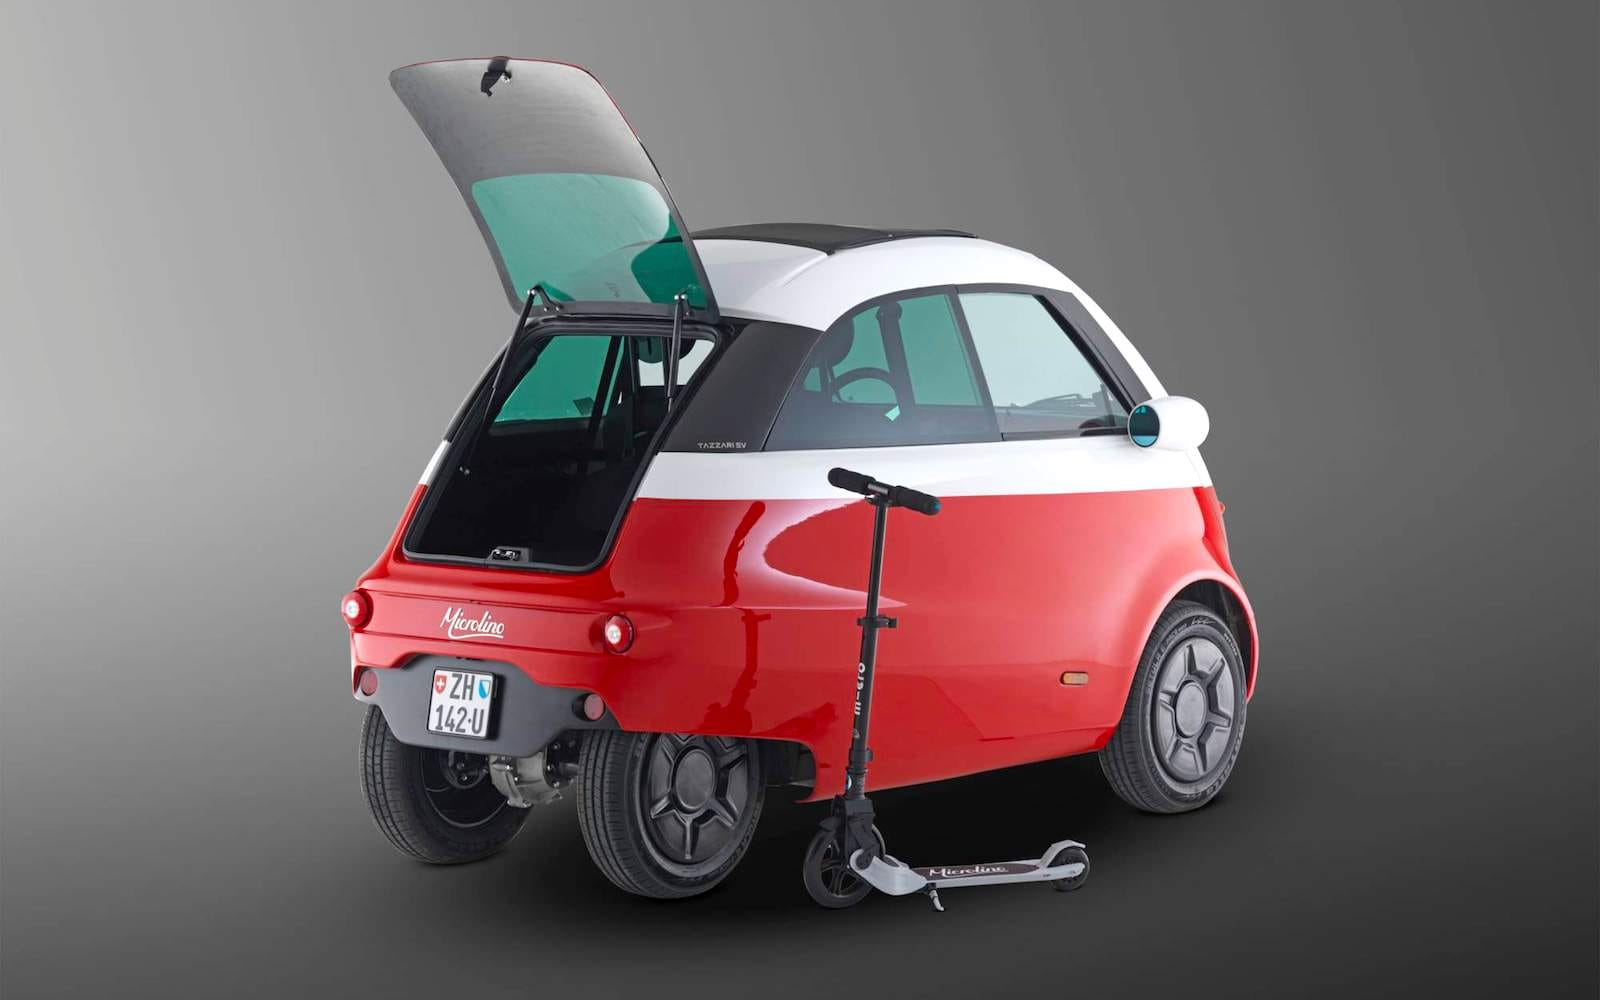 Micro-Mobility-Microlino-5.jpeg.pagespeed.ce.8bpom9E-VU